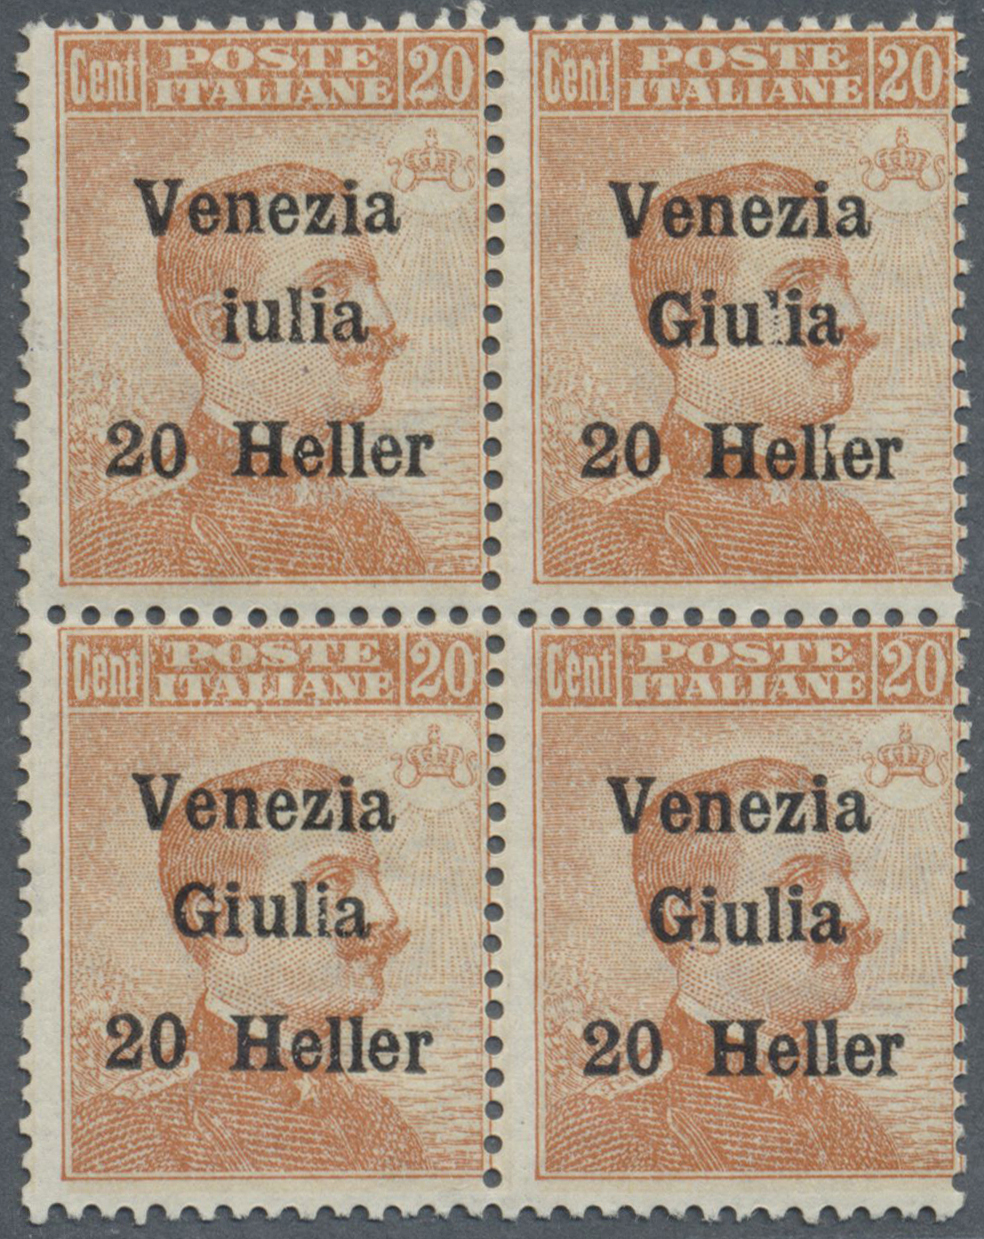 Lot 17130 - Italienische Besetzung 1918/23 - Julisch-Venetien  -  Auktionshaus Christoph Gärtner GmbH & Co. KG Single lots Philately Overseas & Europe. Auction #39 Day 4